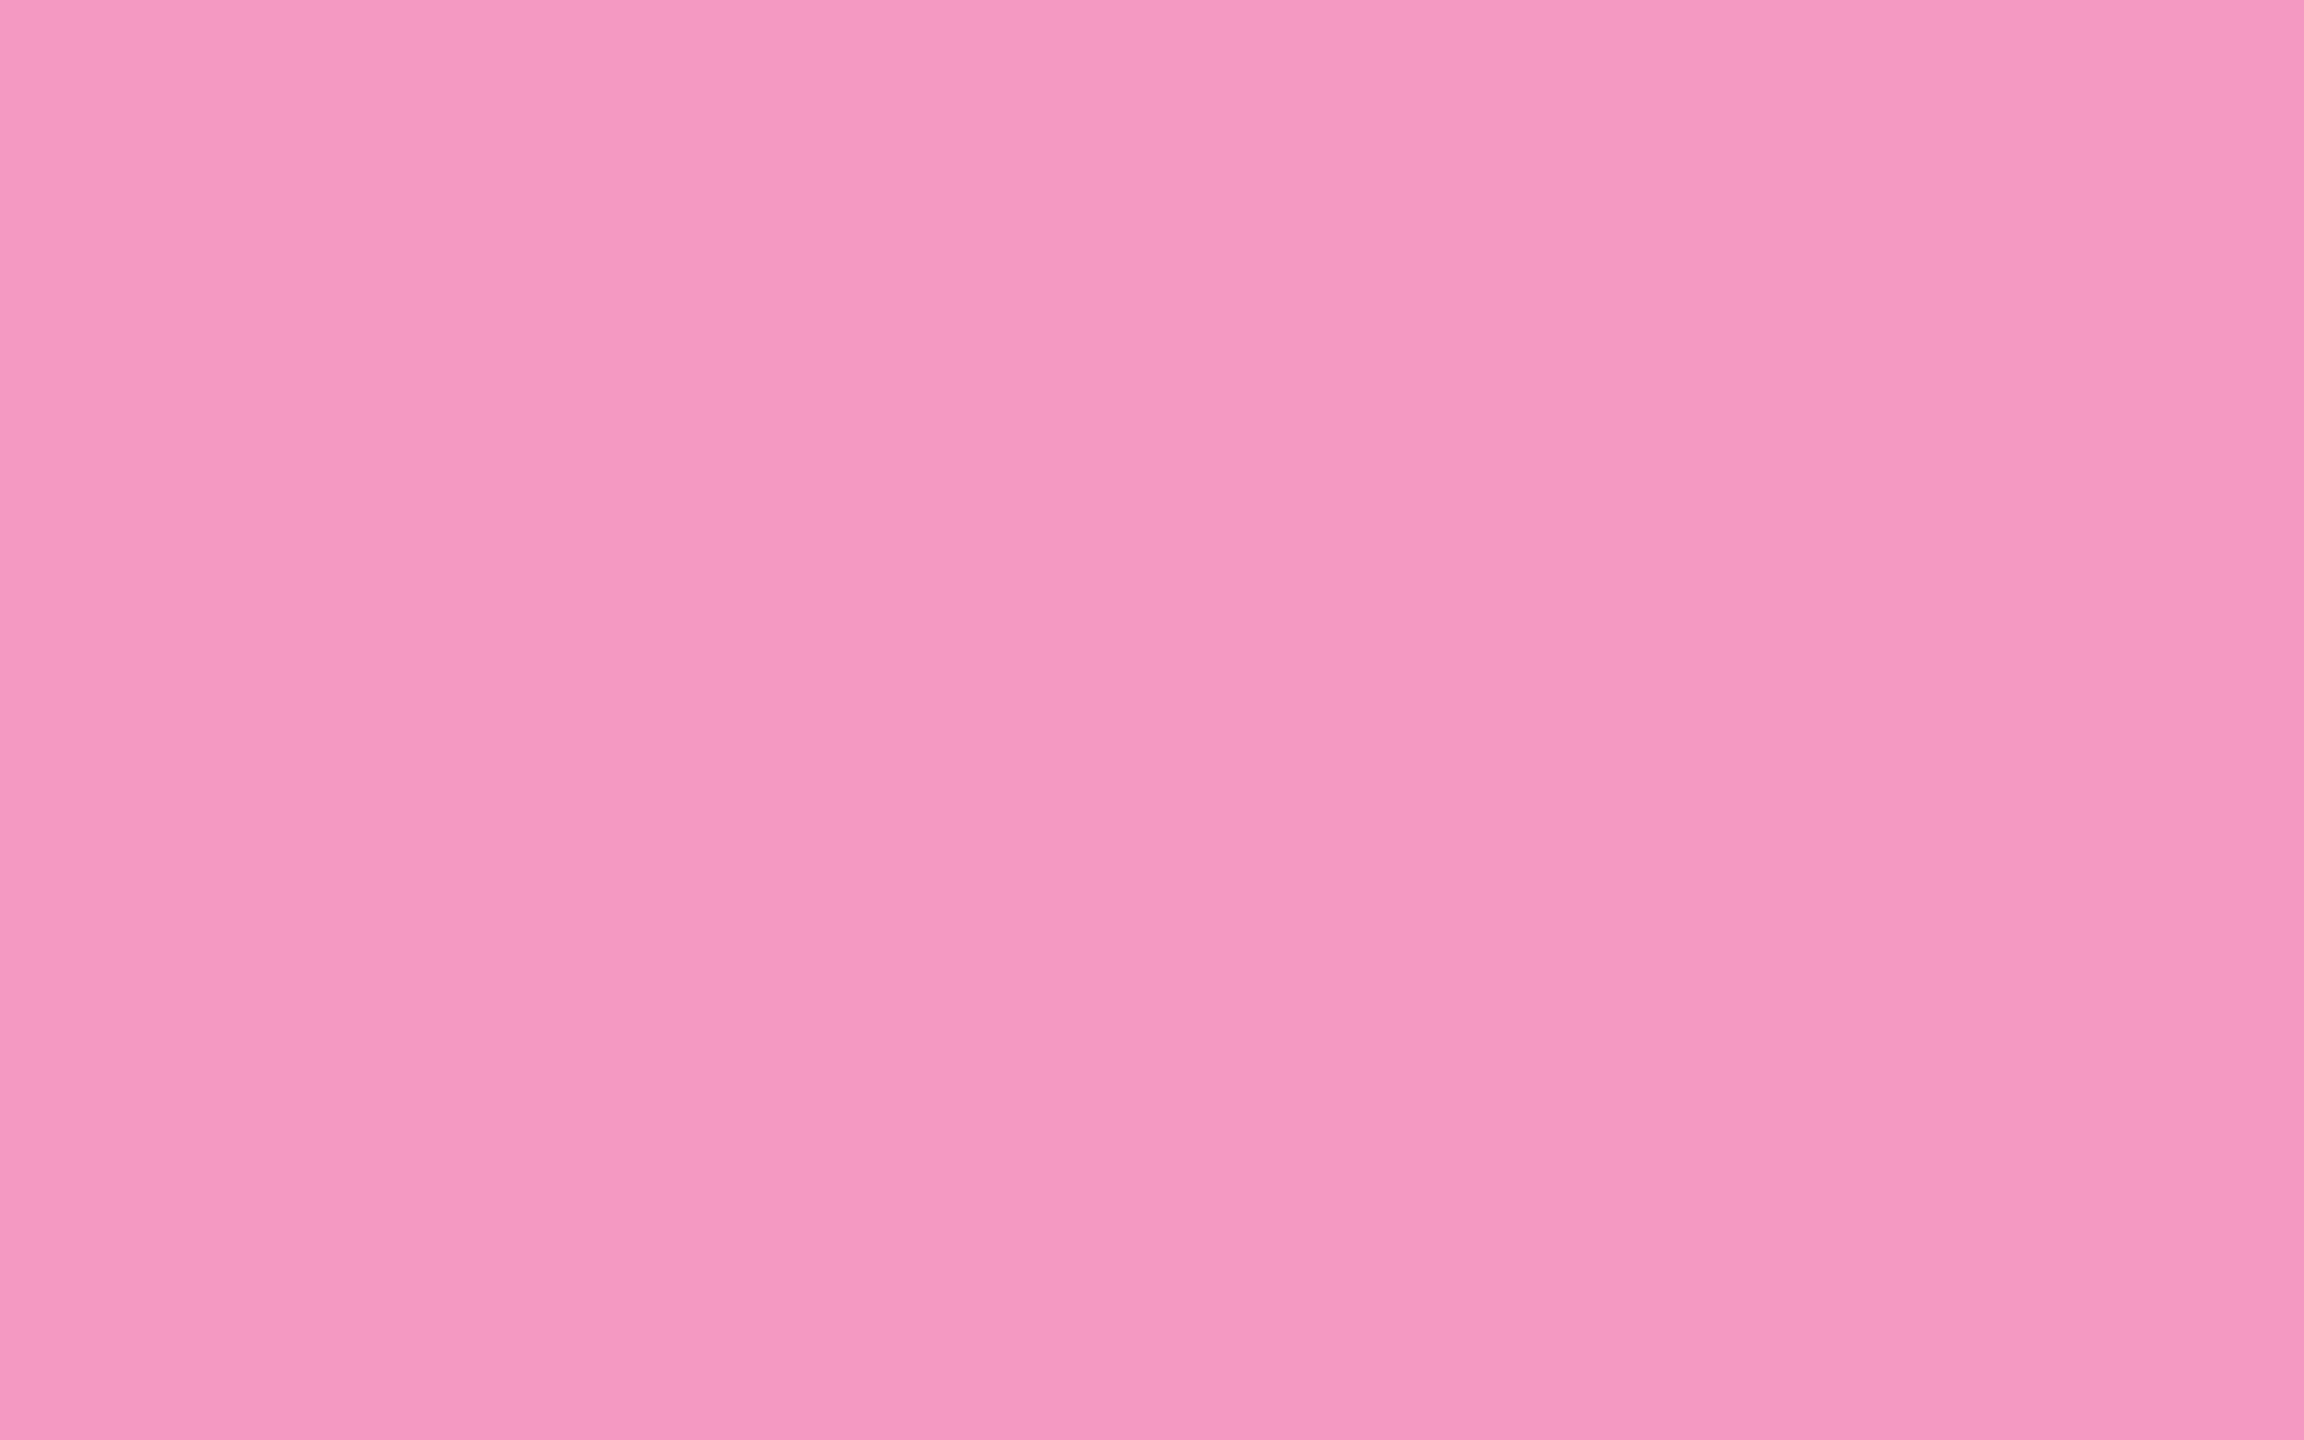 2304x1440 Pastel Magenta Solid Color Background